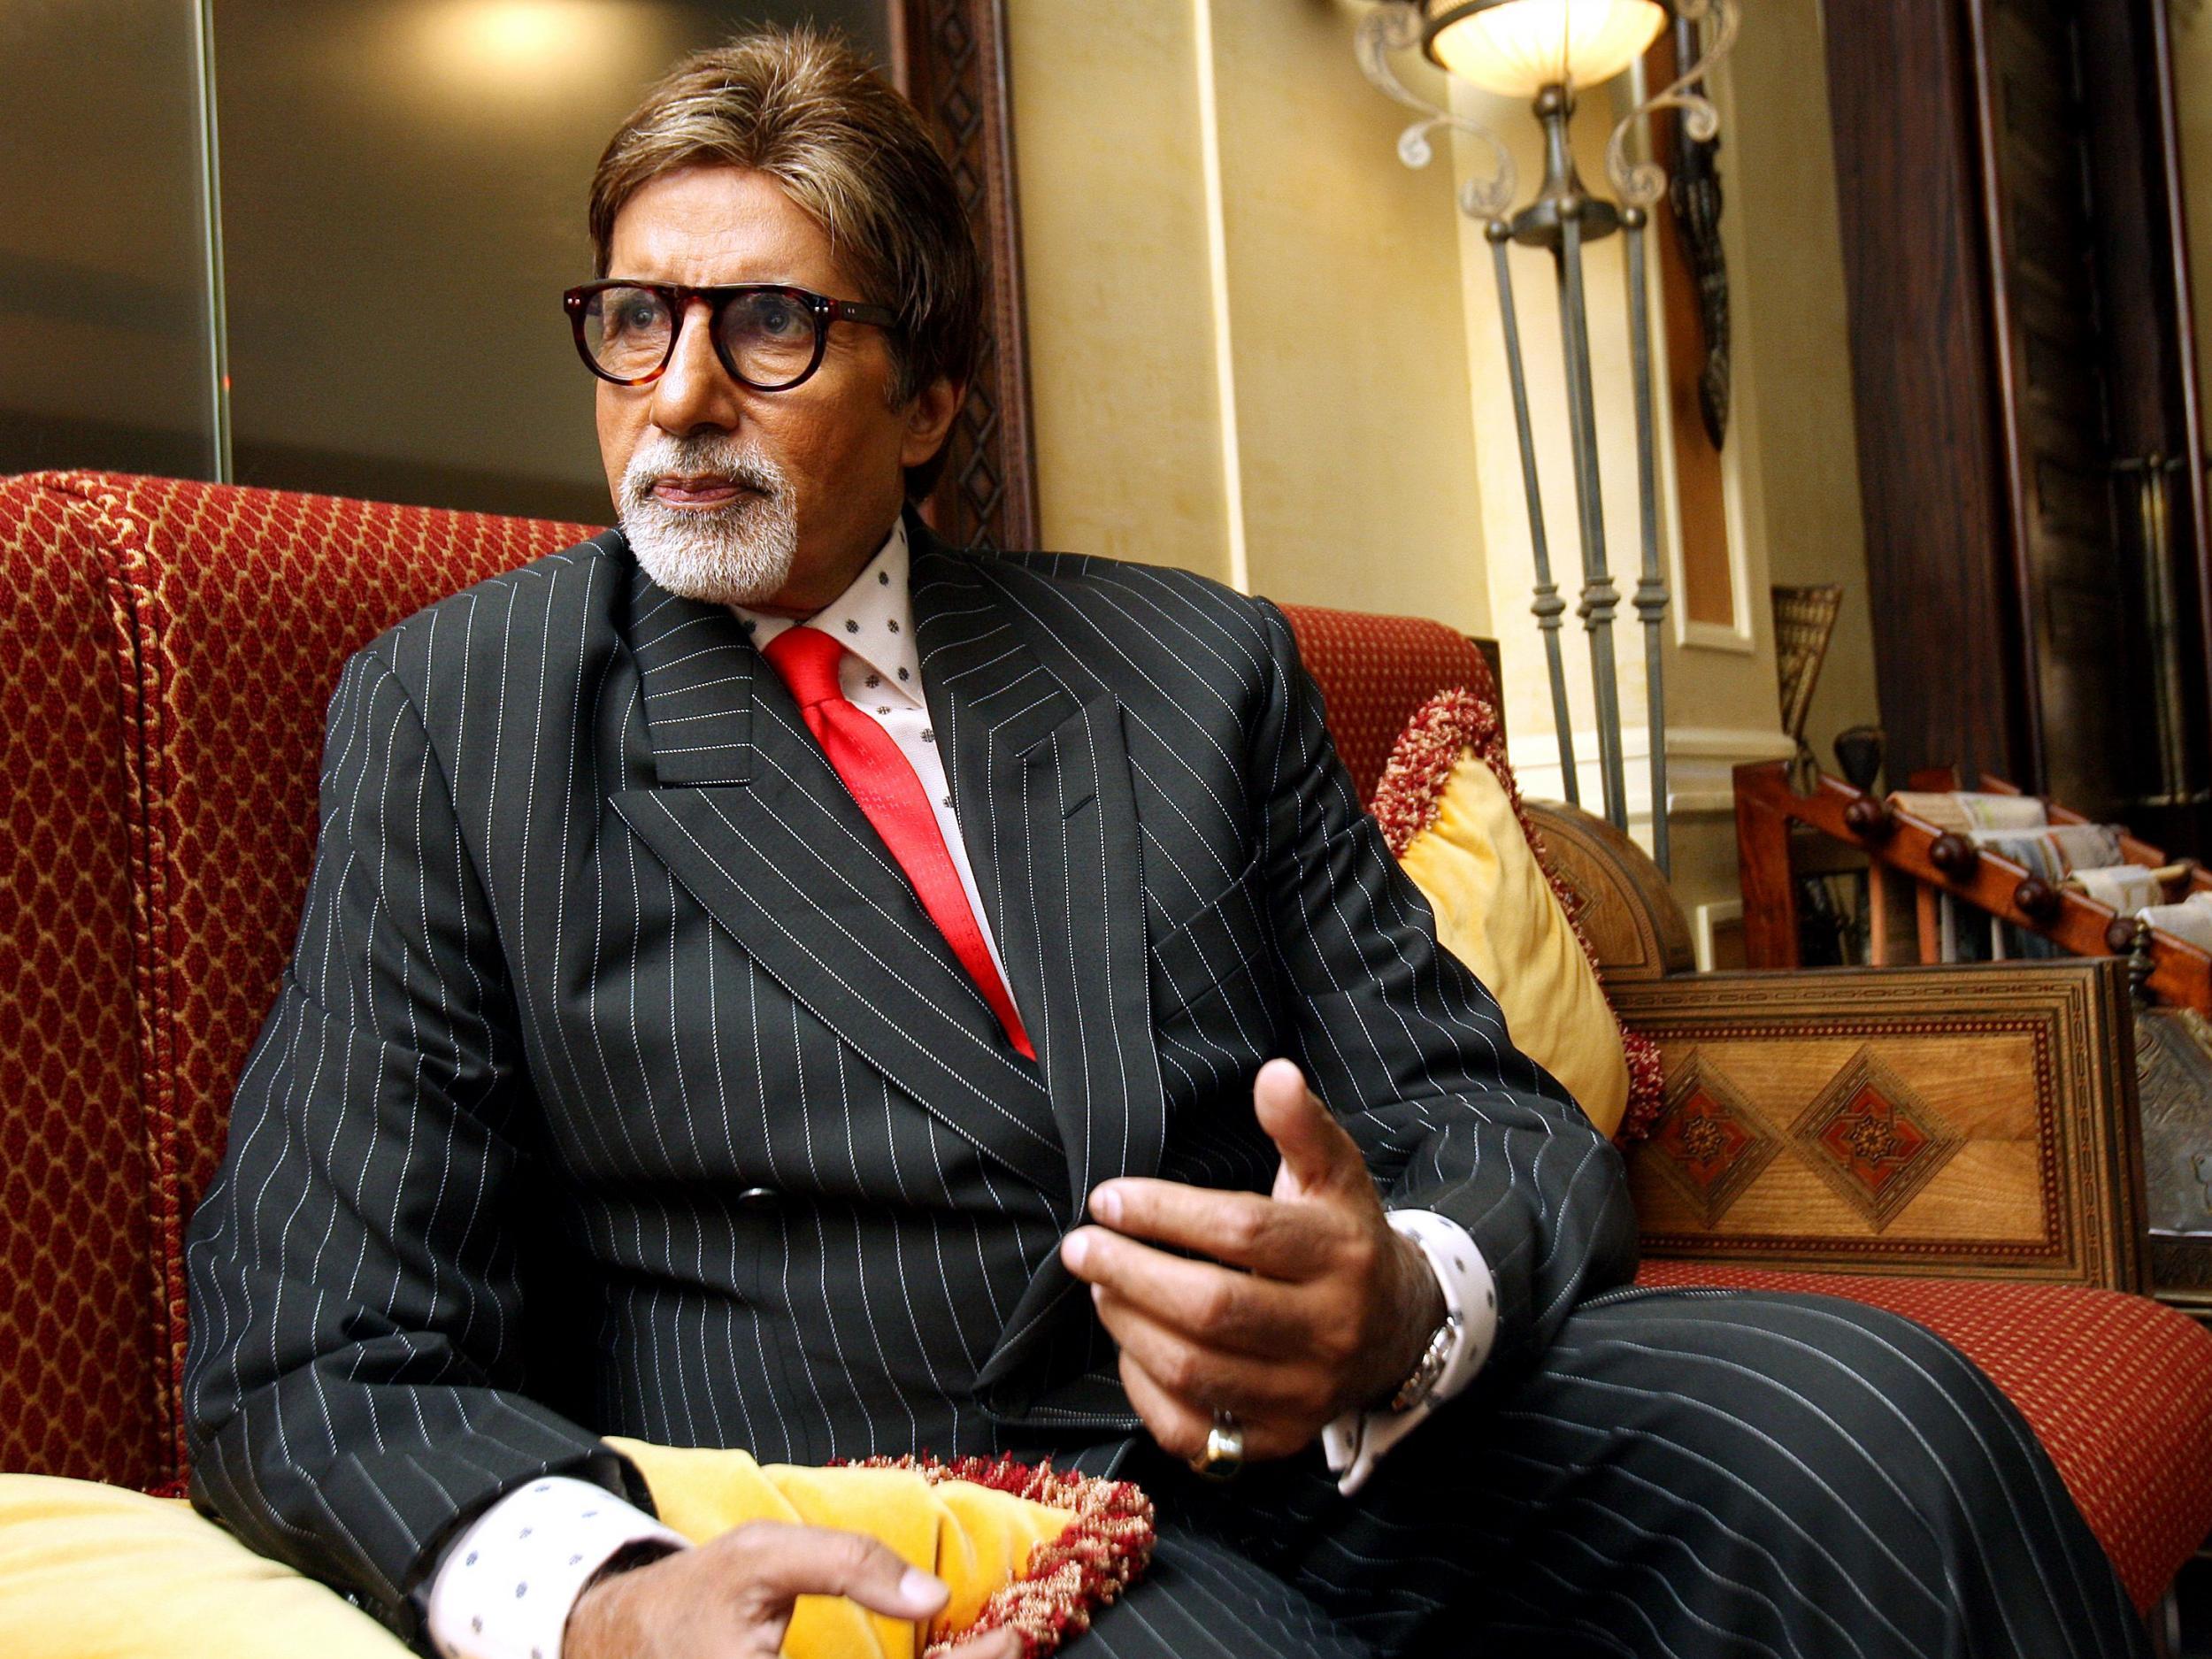 Amitabh Bachchan: Bollywood star in hospital with coronavirus